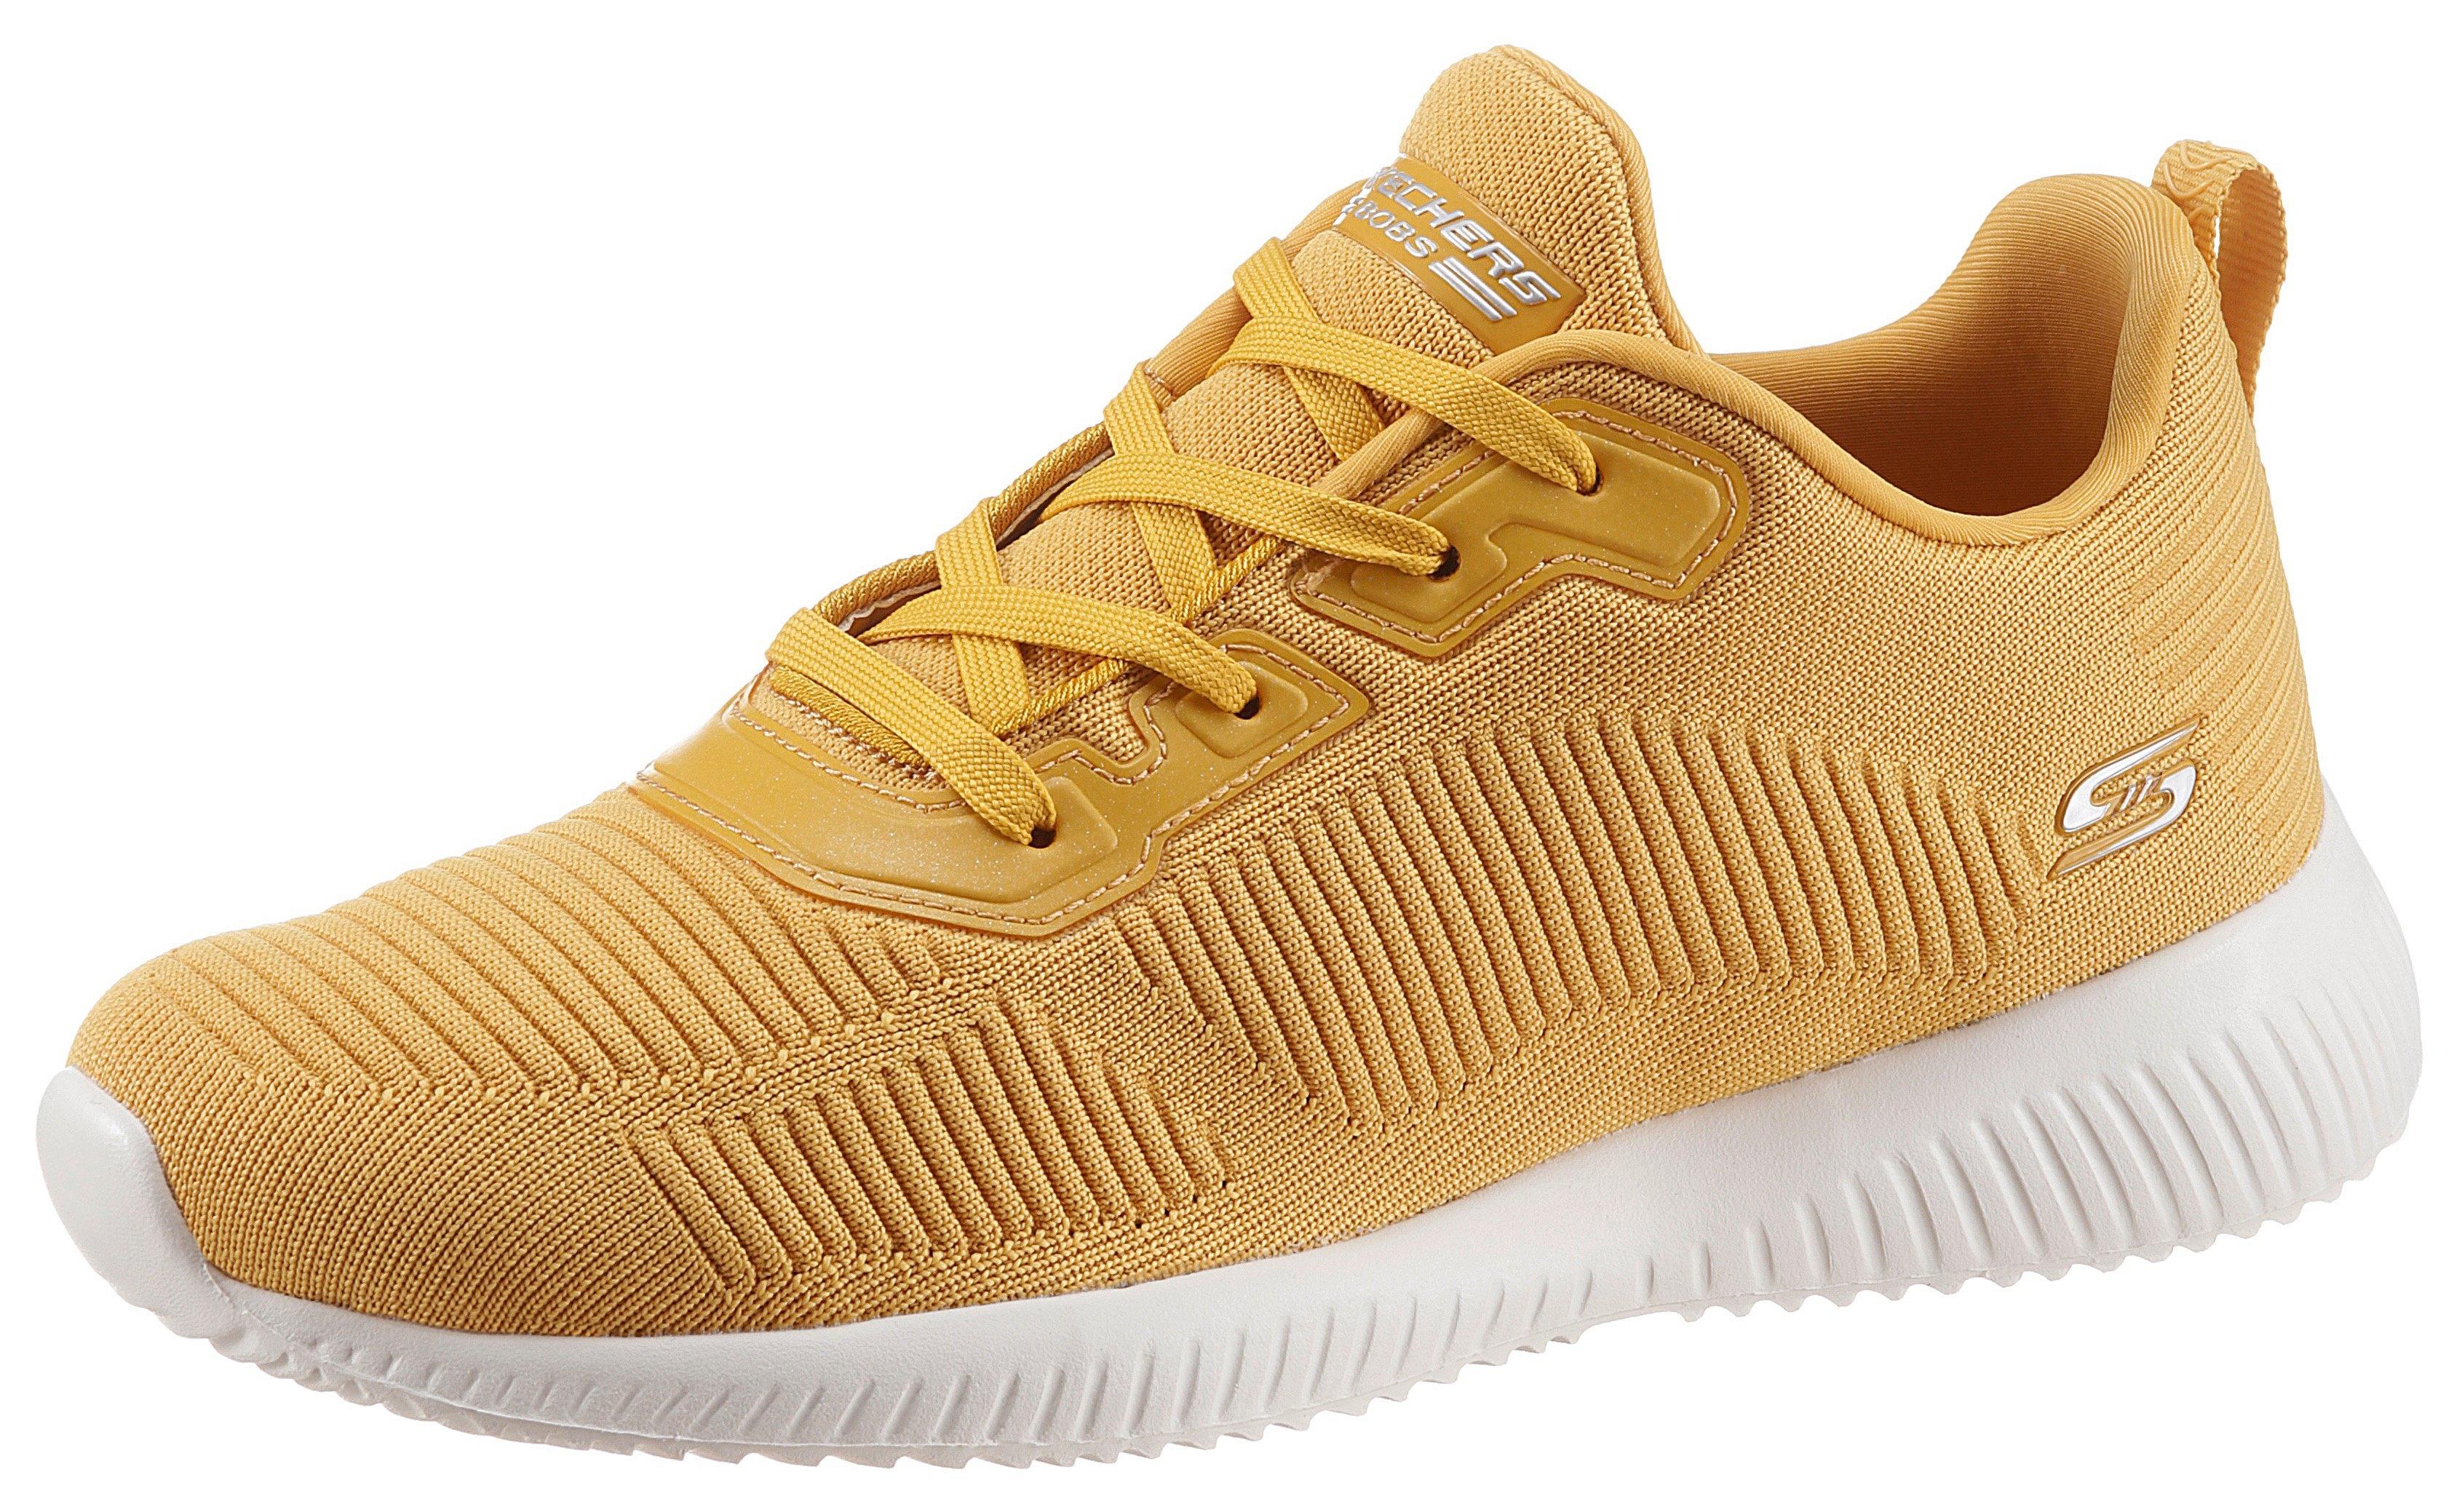 Skechers sneakers BOBS SQUAD - TOUGH TALK in tricot-look - verschillende betaalmethodes